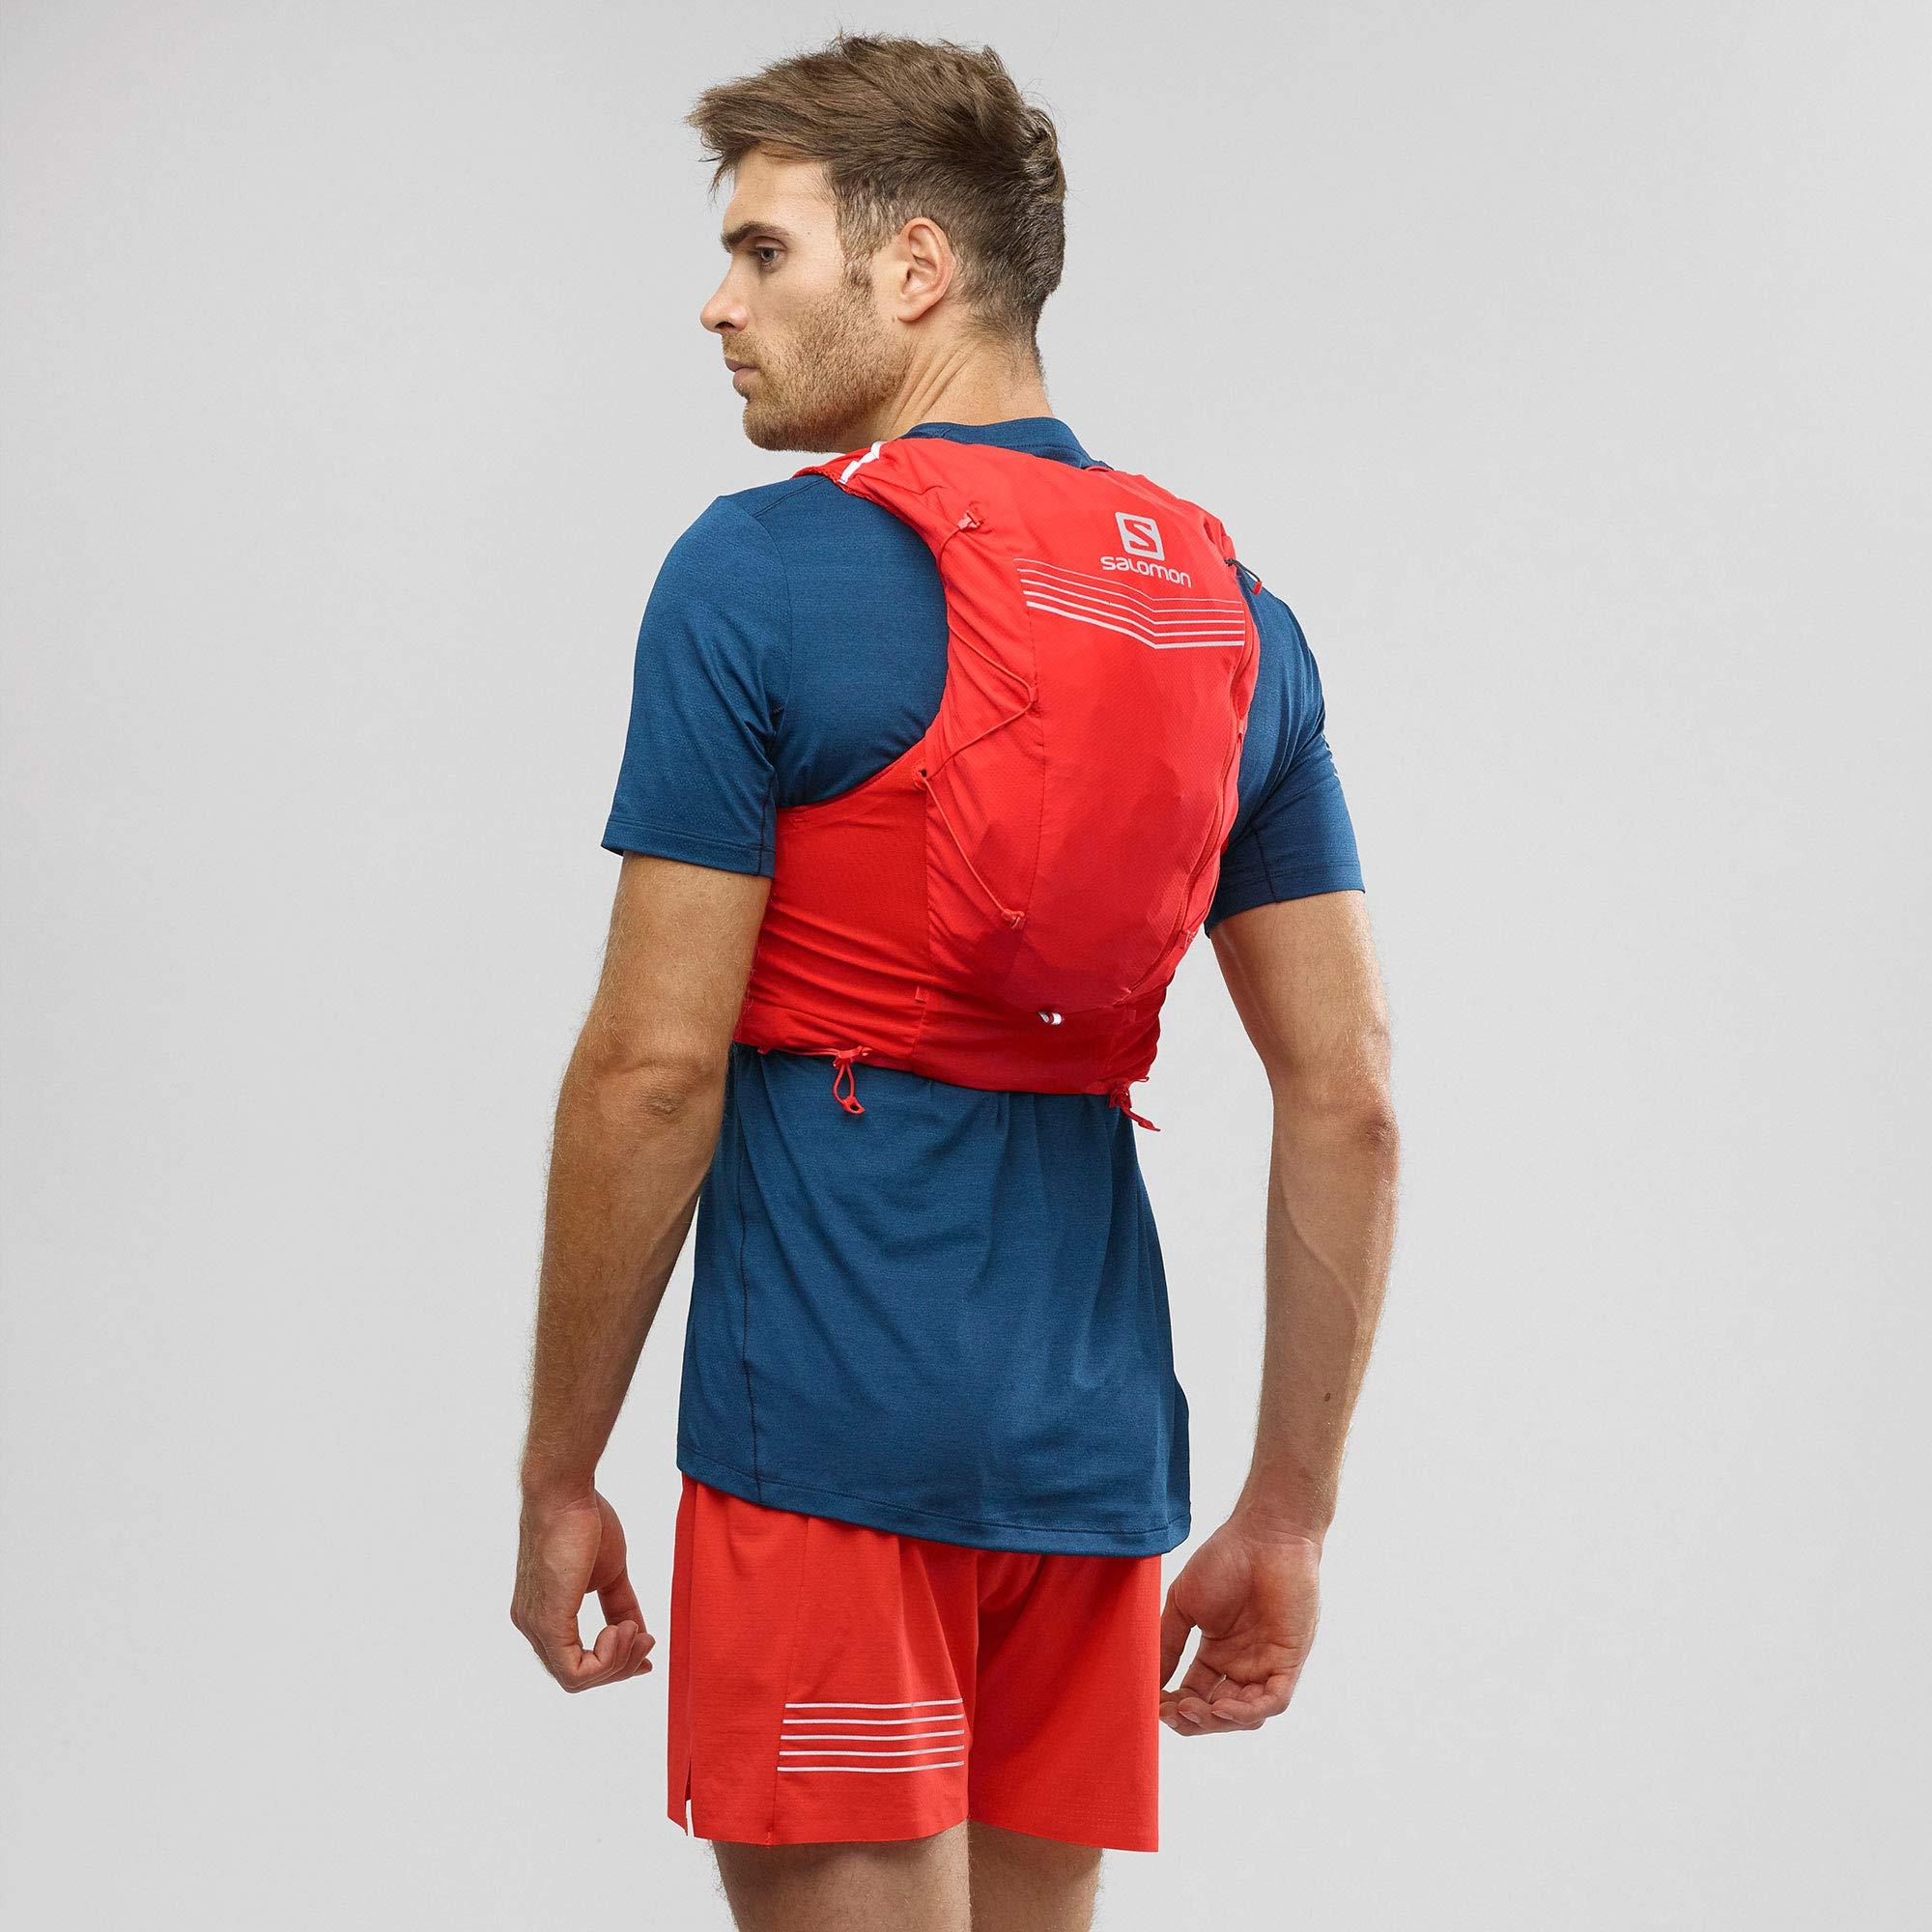 Salomon Mens Advanced Skin 12 Set Running Vest, Fiery Red, X-Large by Salomon (Image #3)